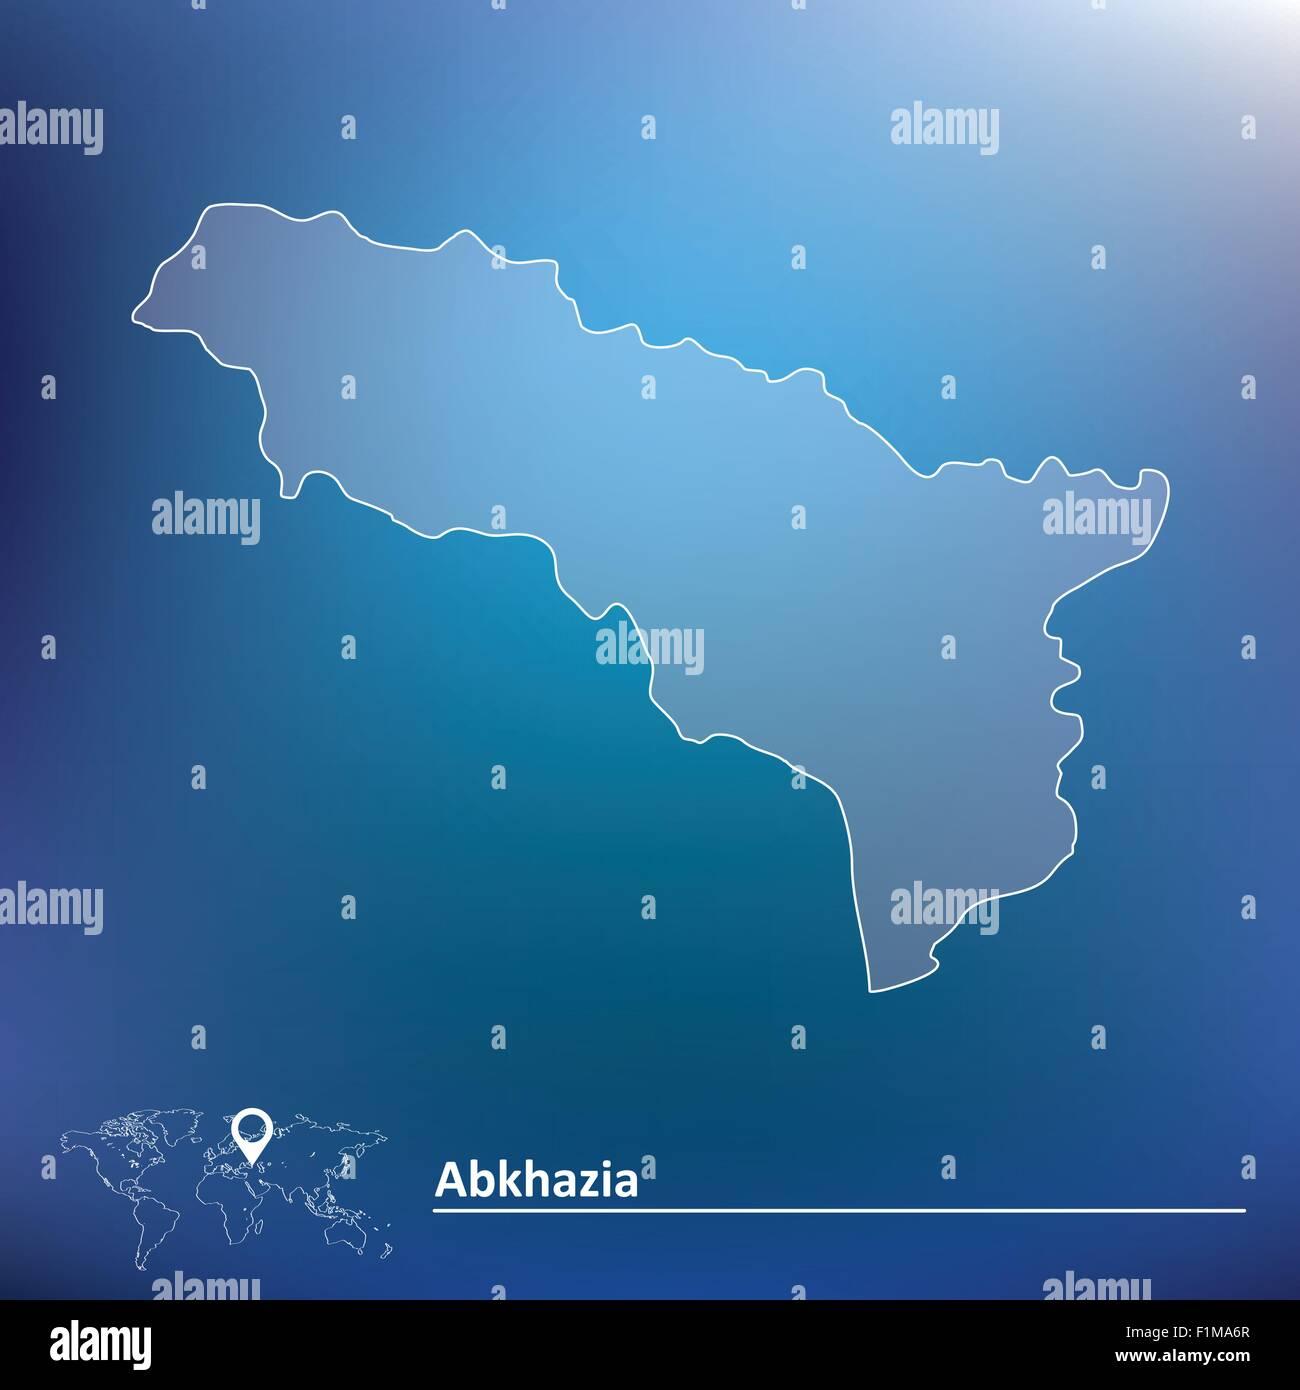 Map of Abkhazia - vector illustration - Stock Vector